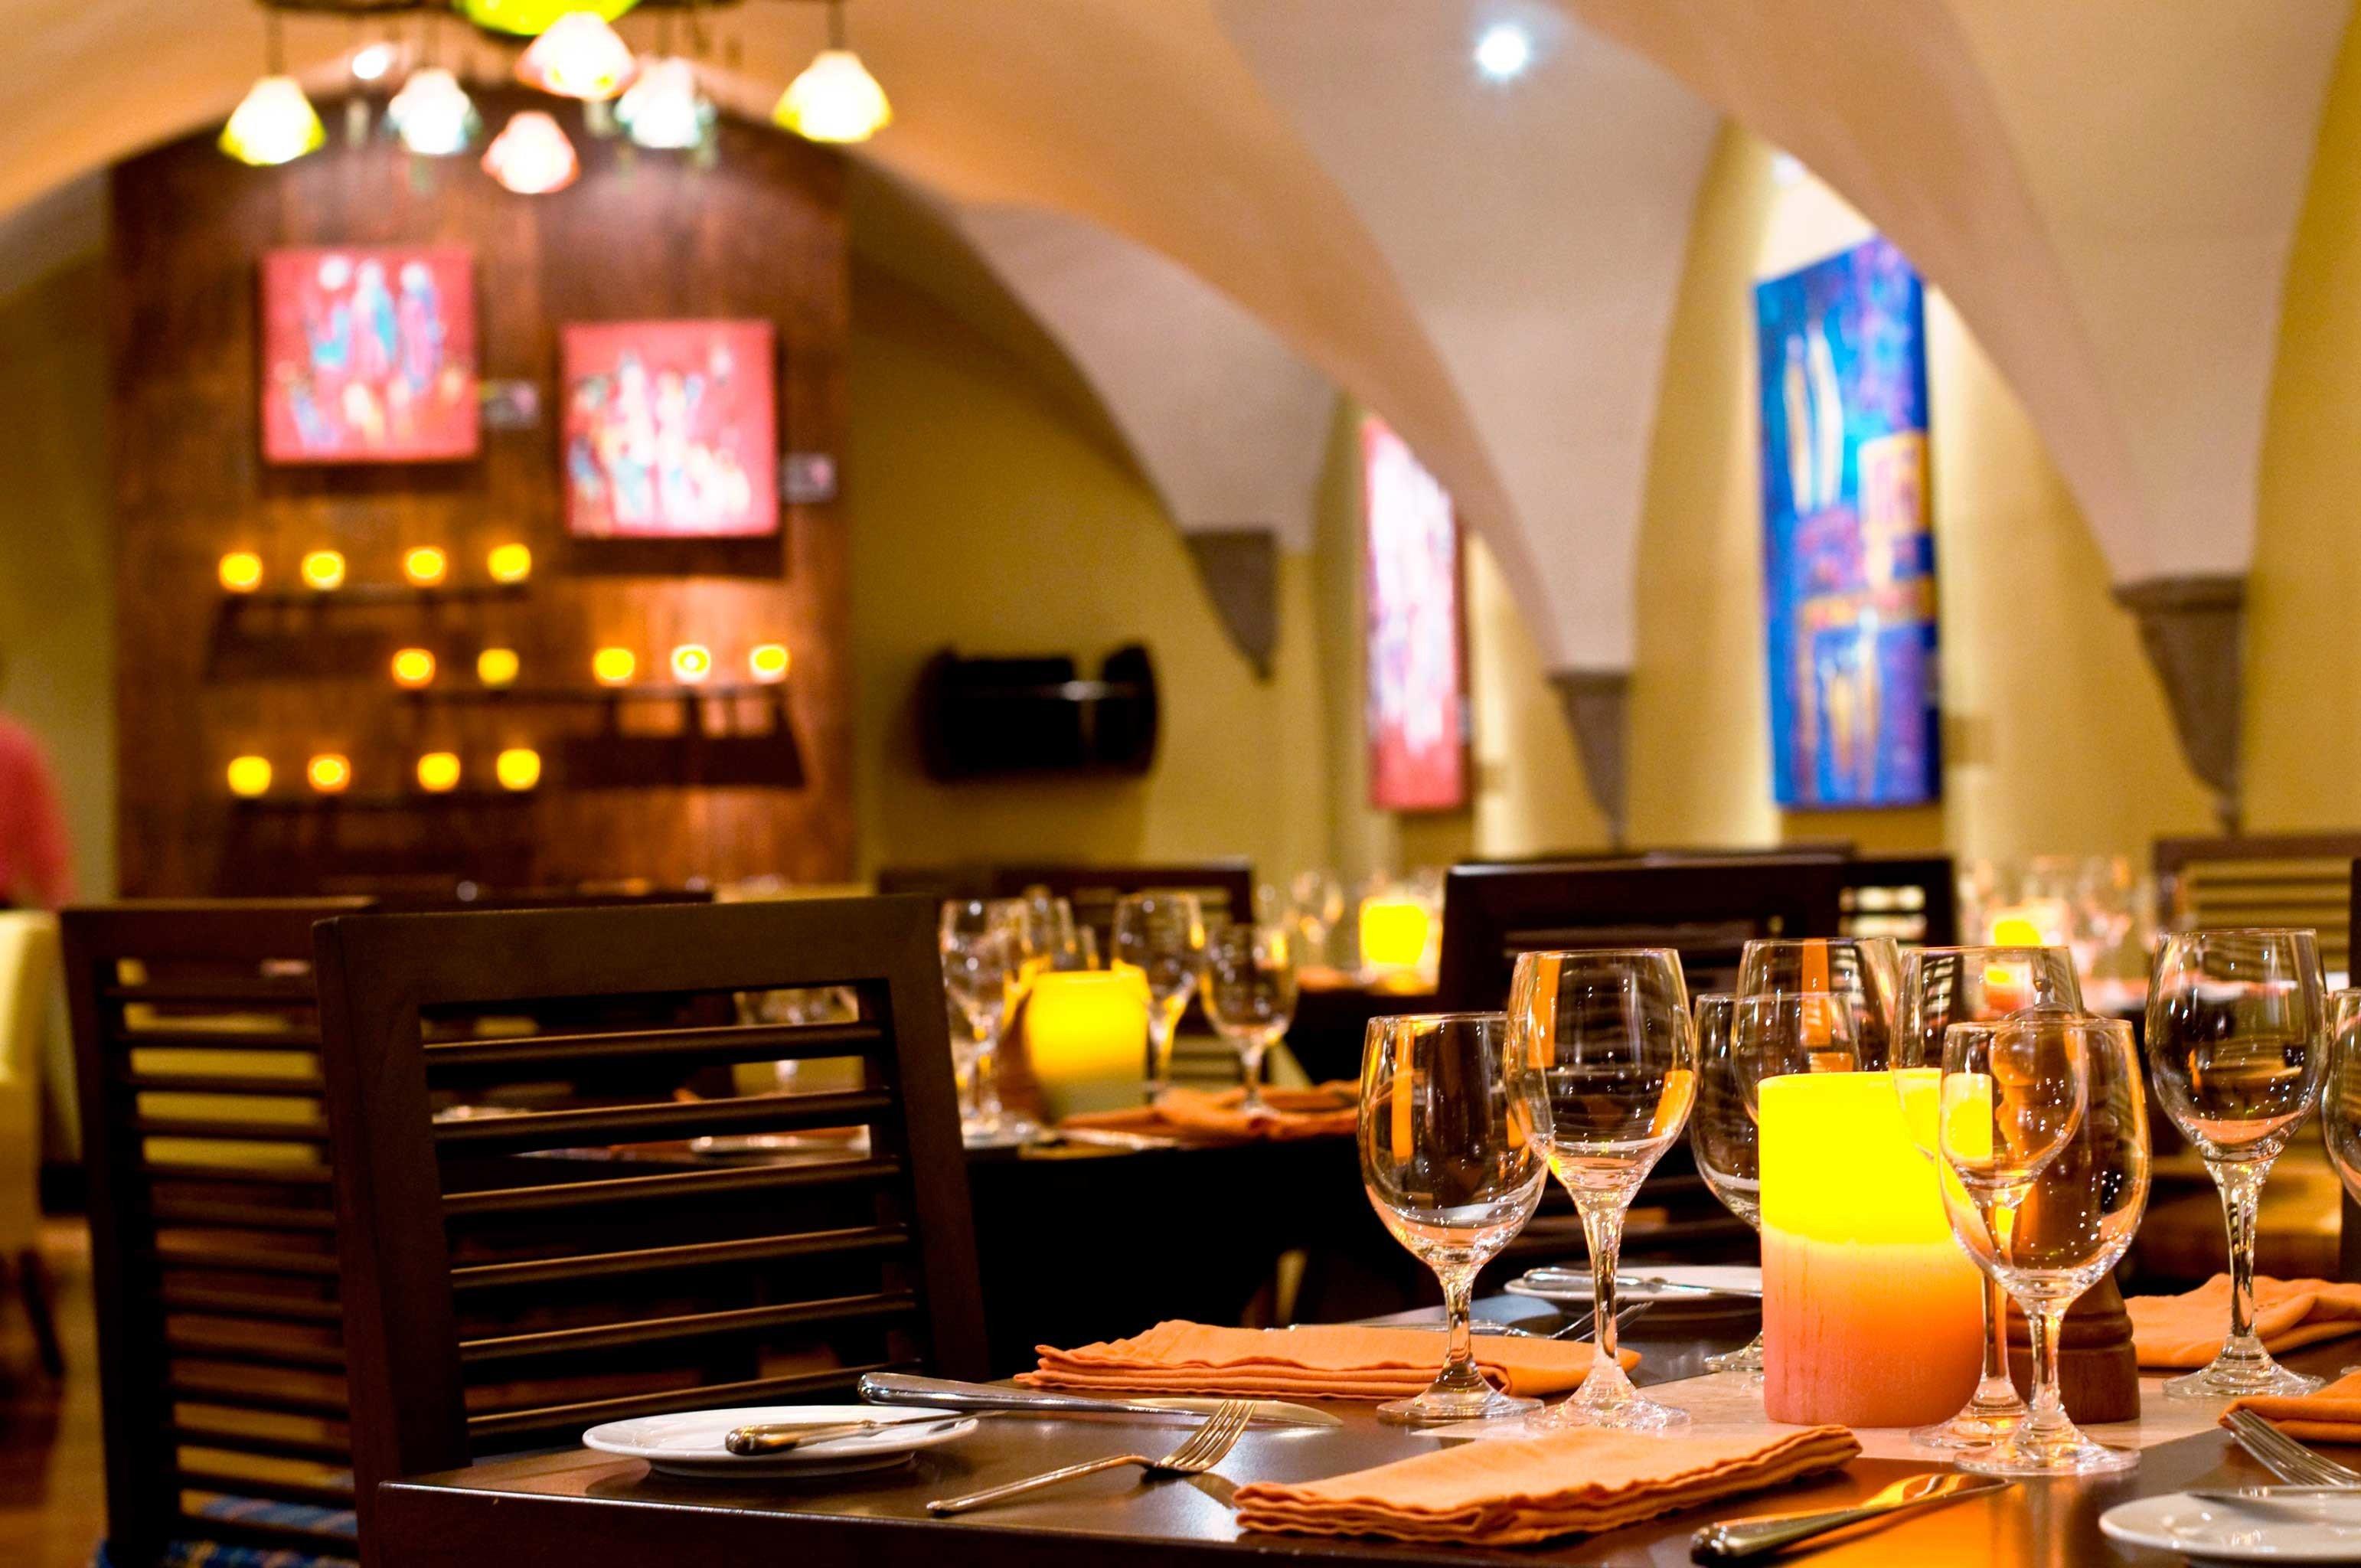 wine restaurant Bar Dining dining table